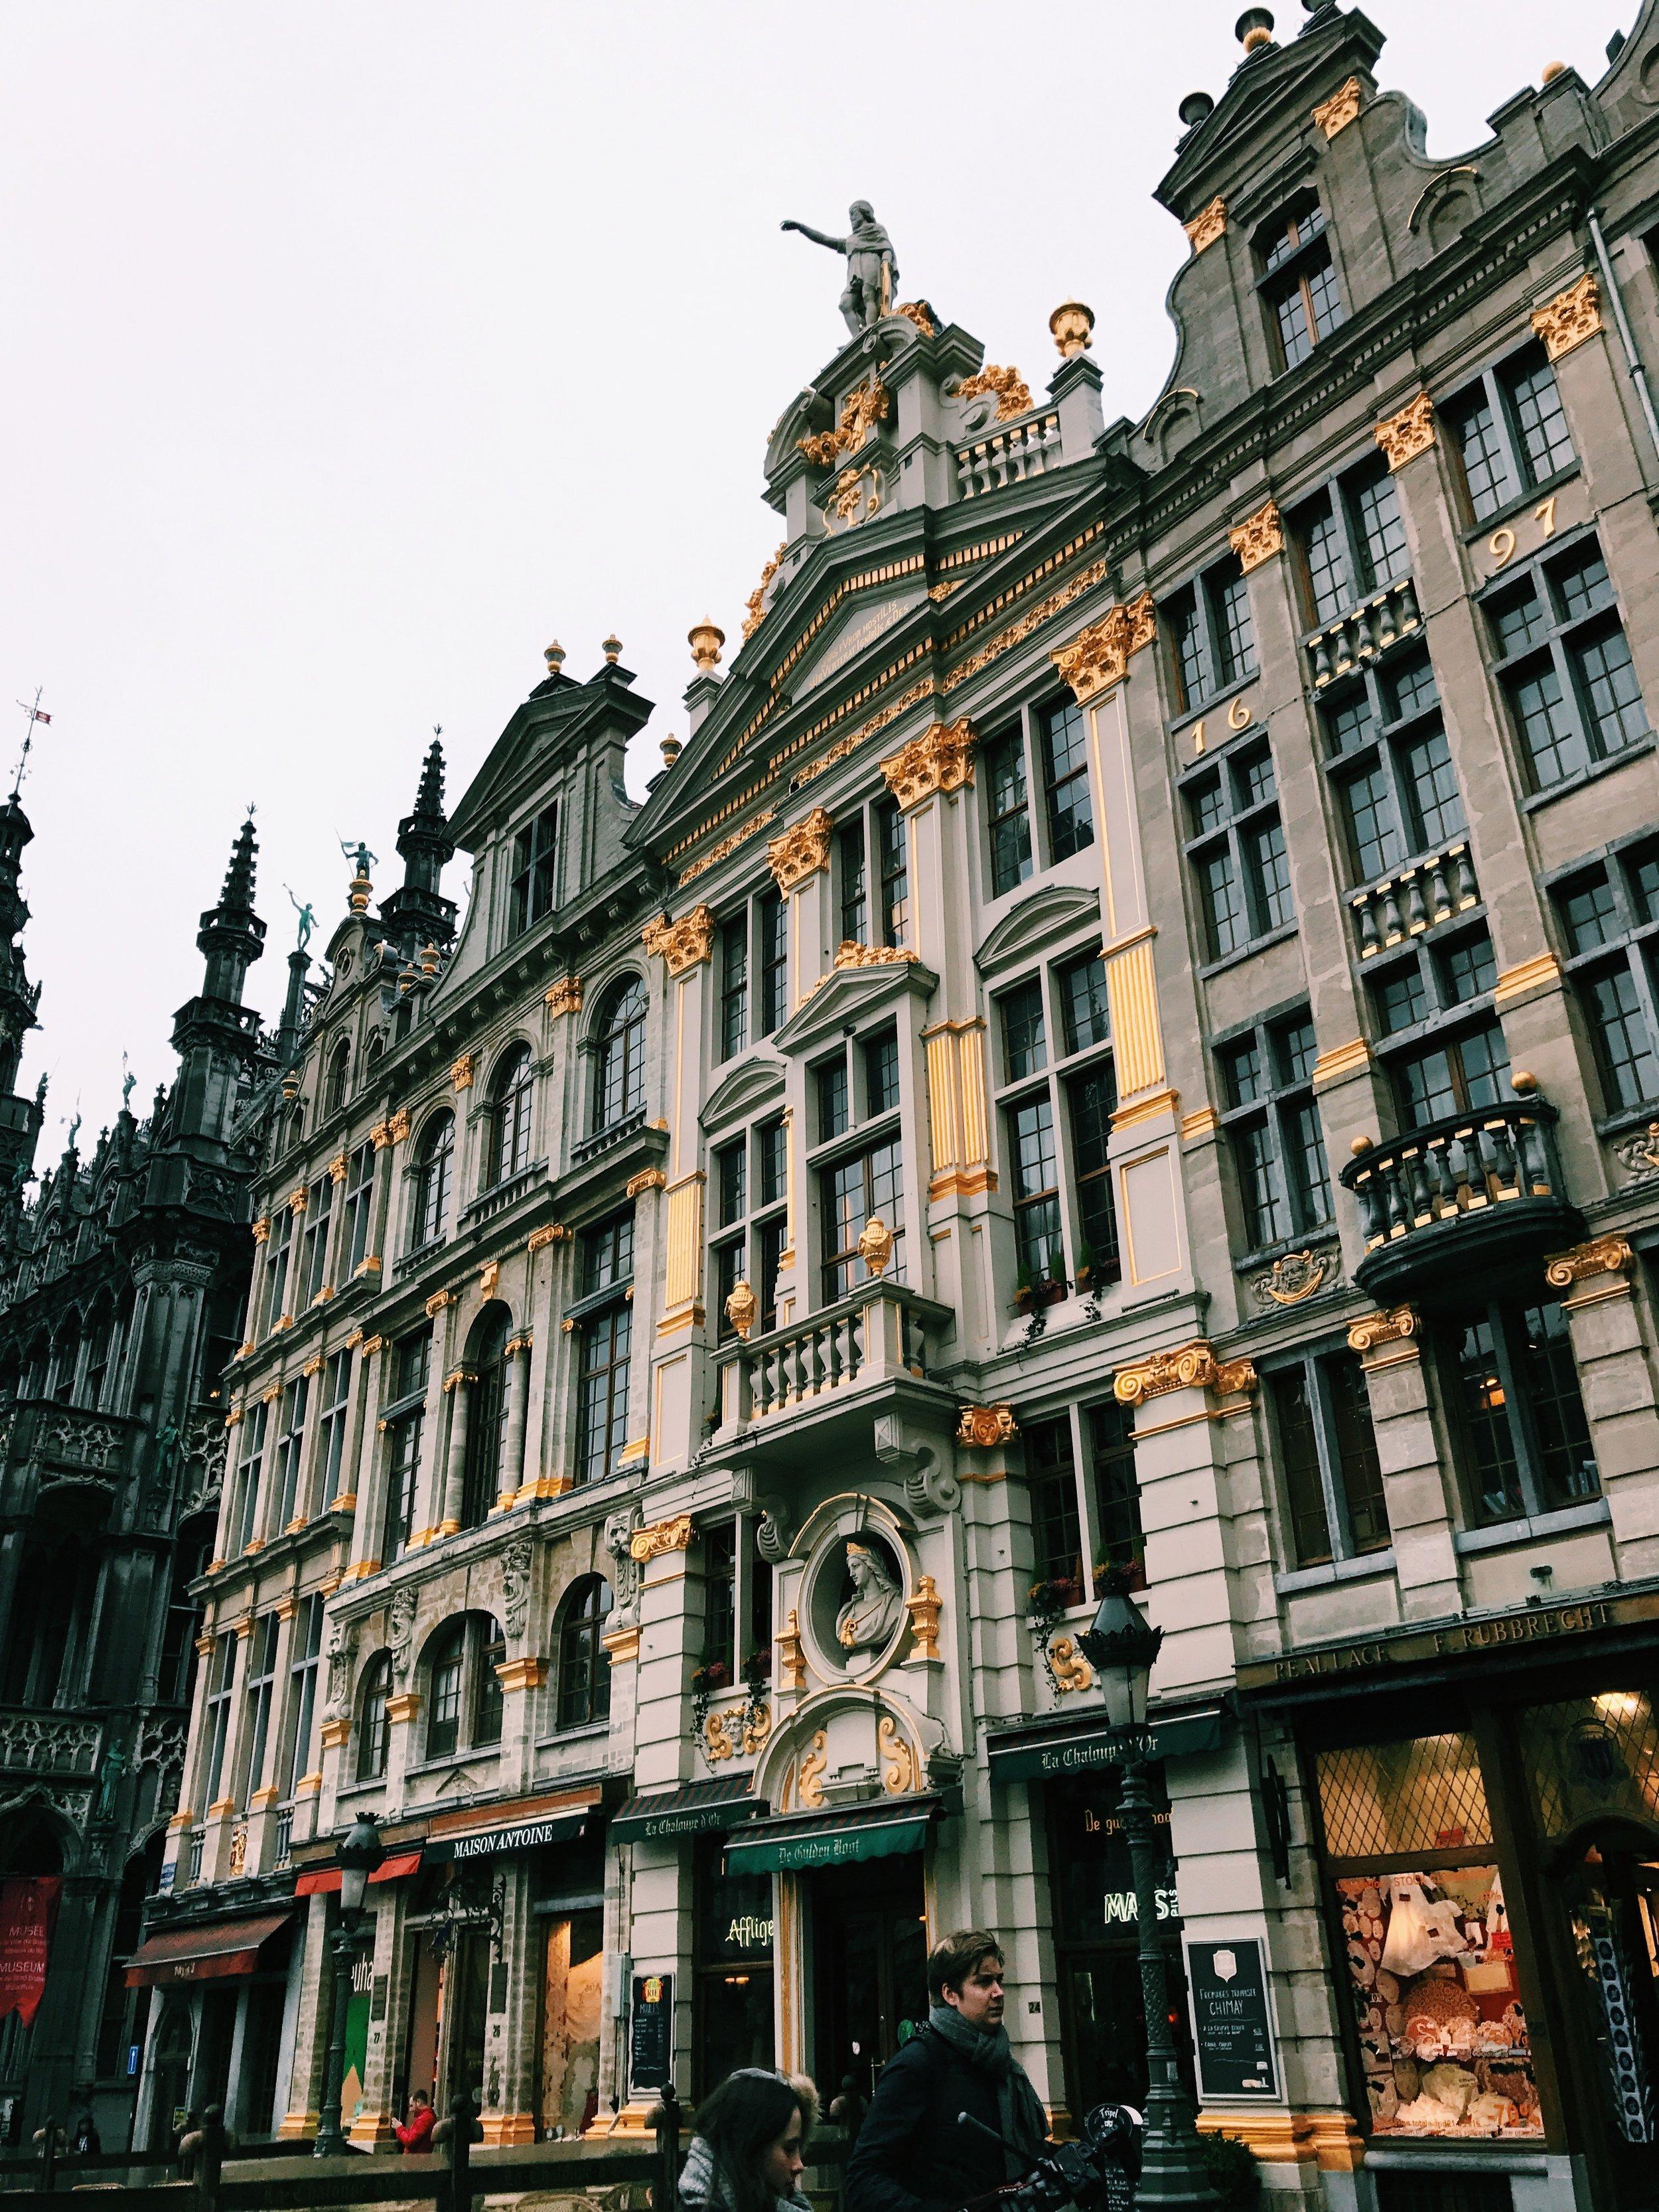 Grote Markt . Brussels, Belgium.